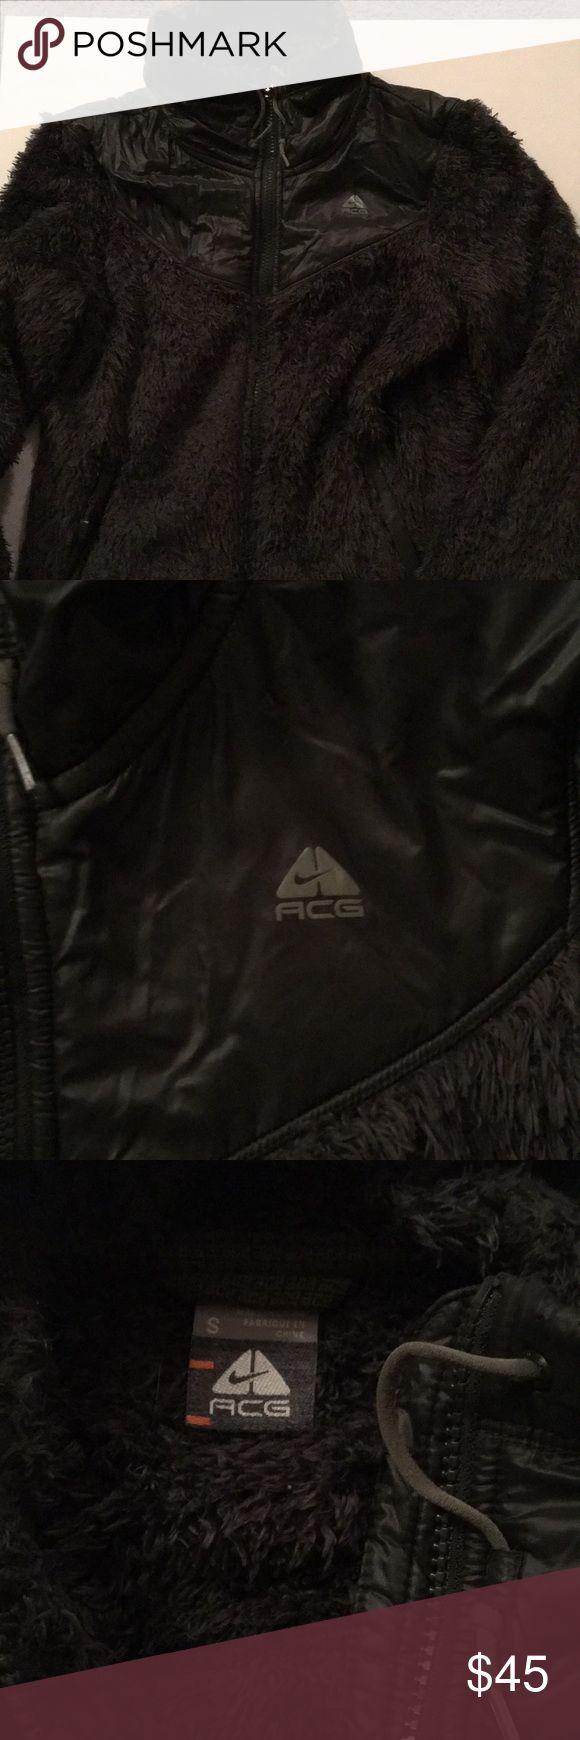 Fleece Nike ACG jacket Nike ACG fleece jacket. Size small. Worn only a few times. Nike ACG Jackets & Coats